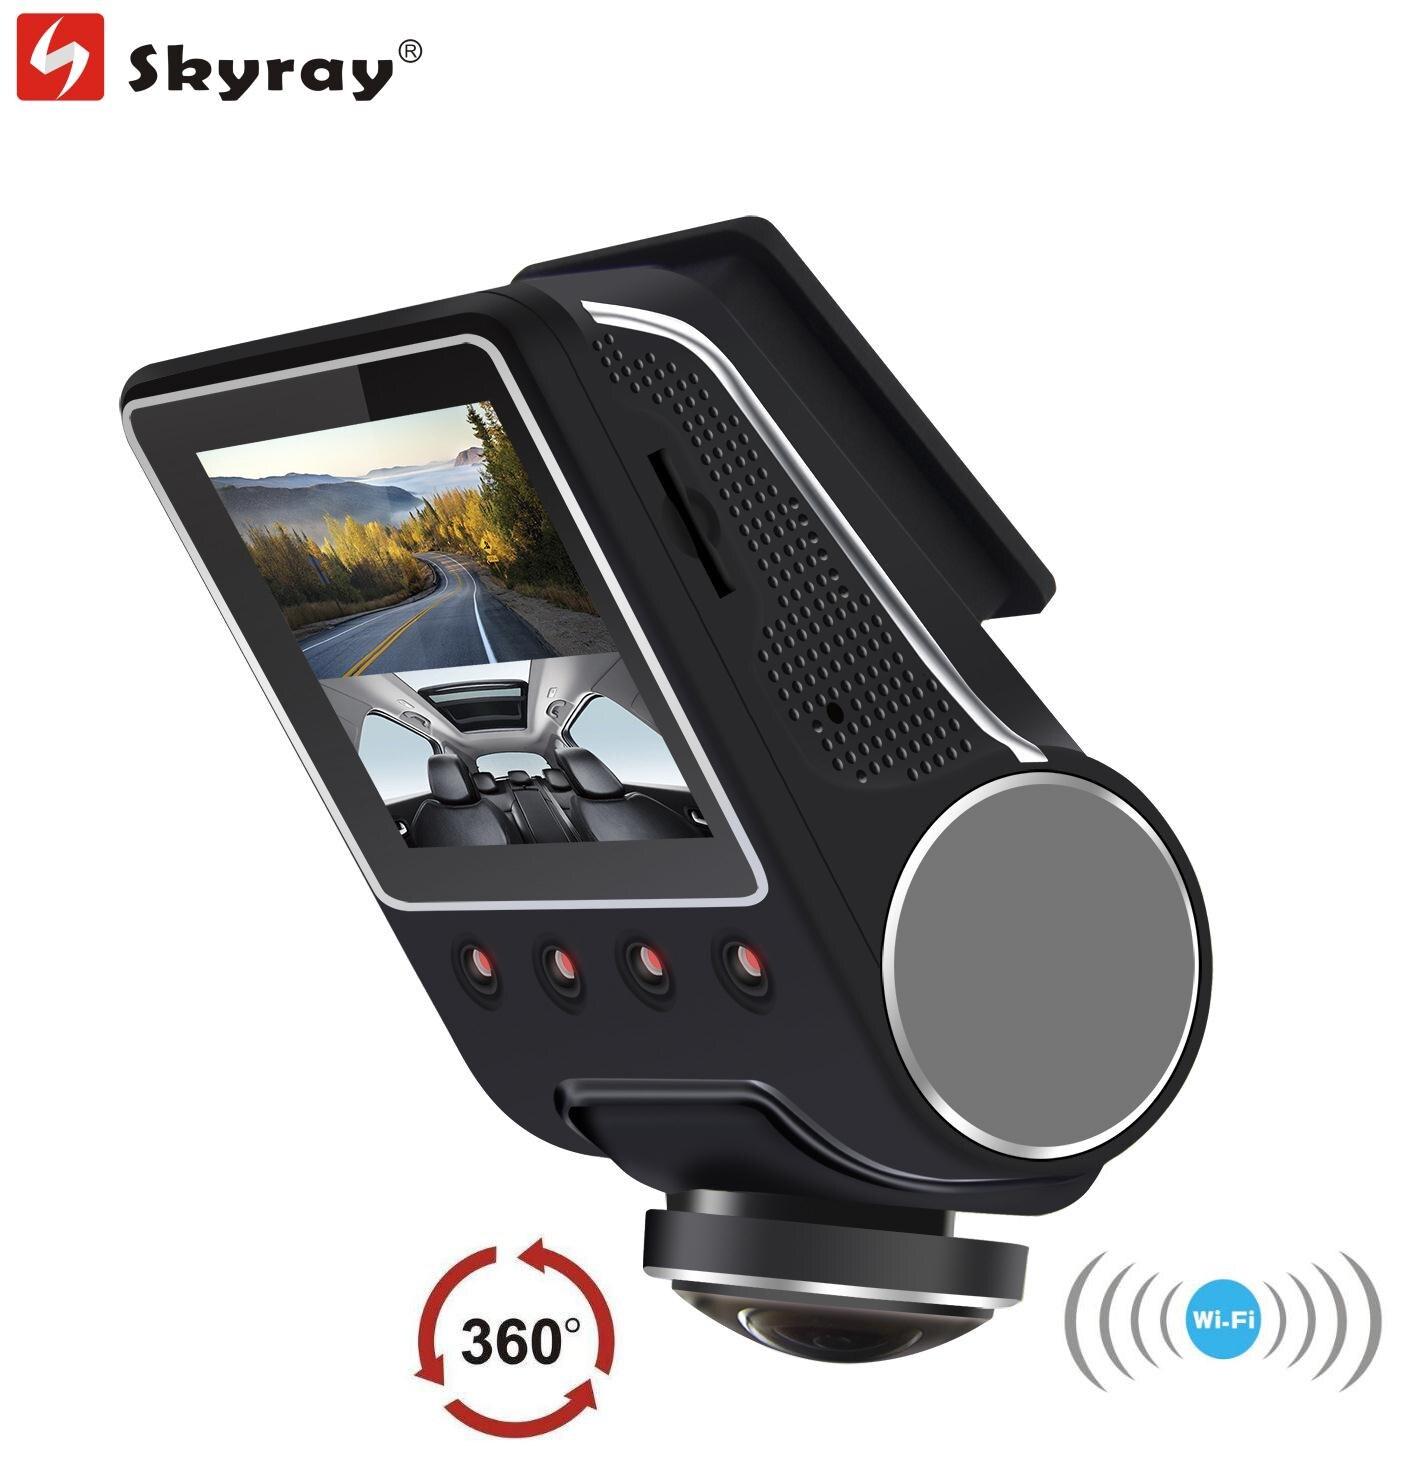 2 5 360 degree full view hd 1080p wifi car dvr digital camcorder camera recorder hidden. Black Bedroom Furniture Sets. Home Design Ideas